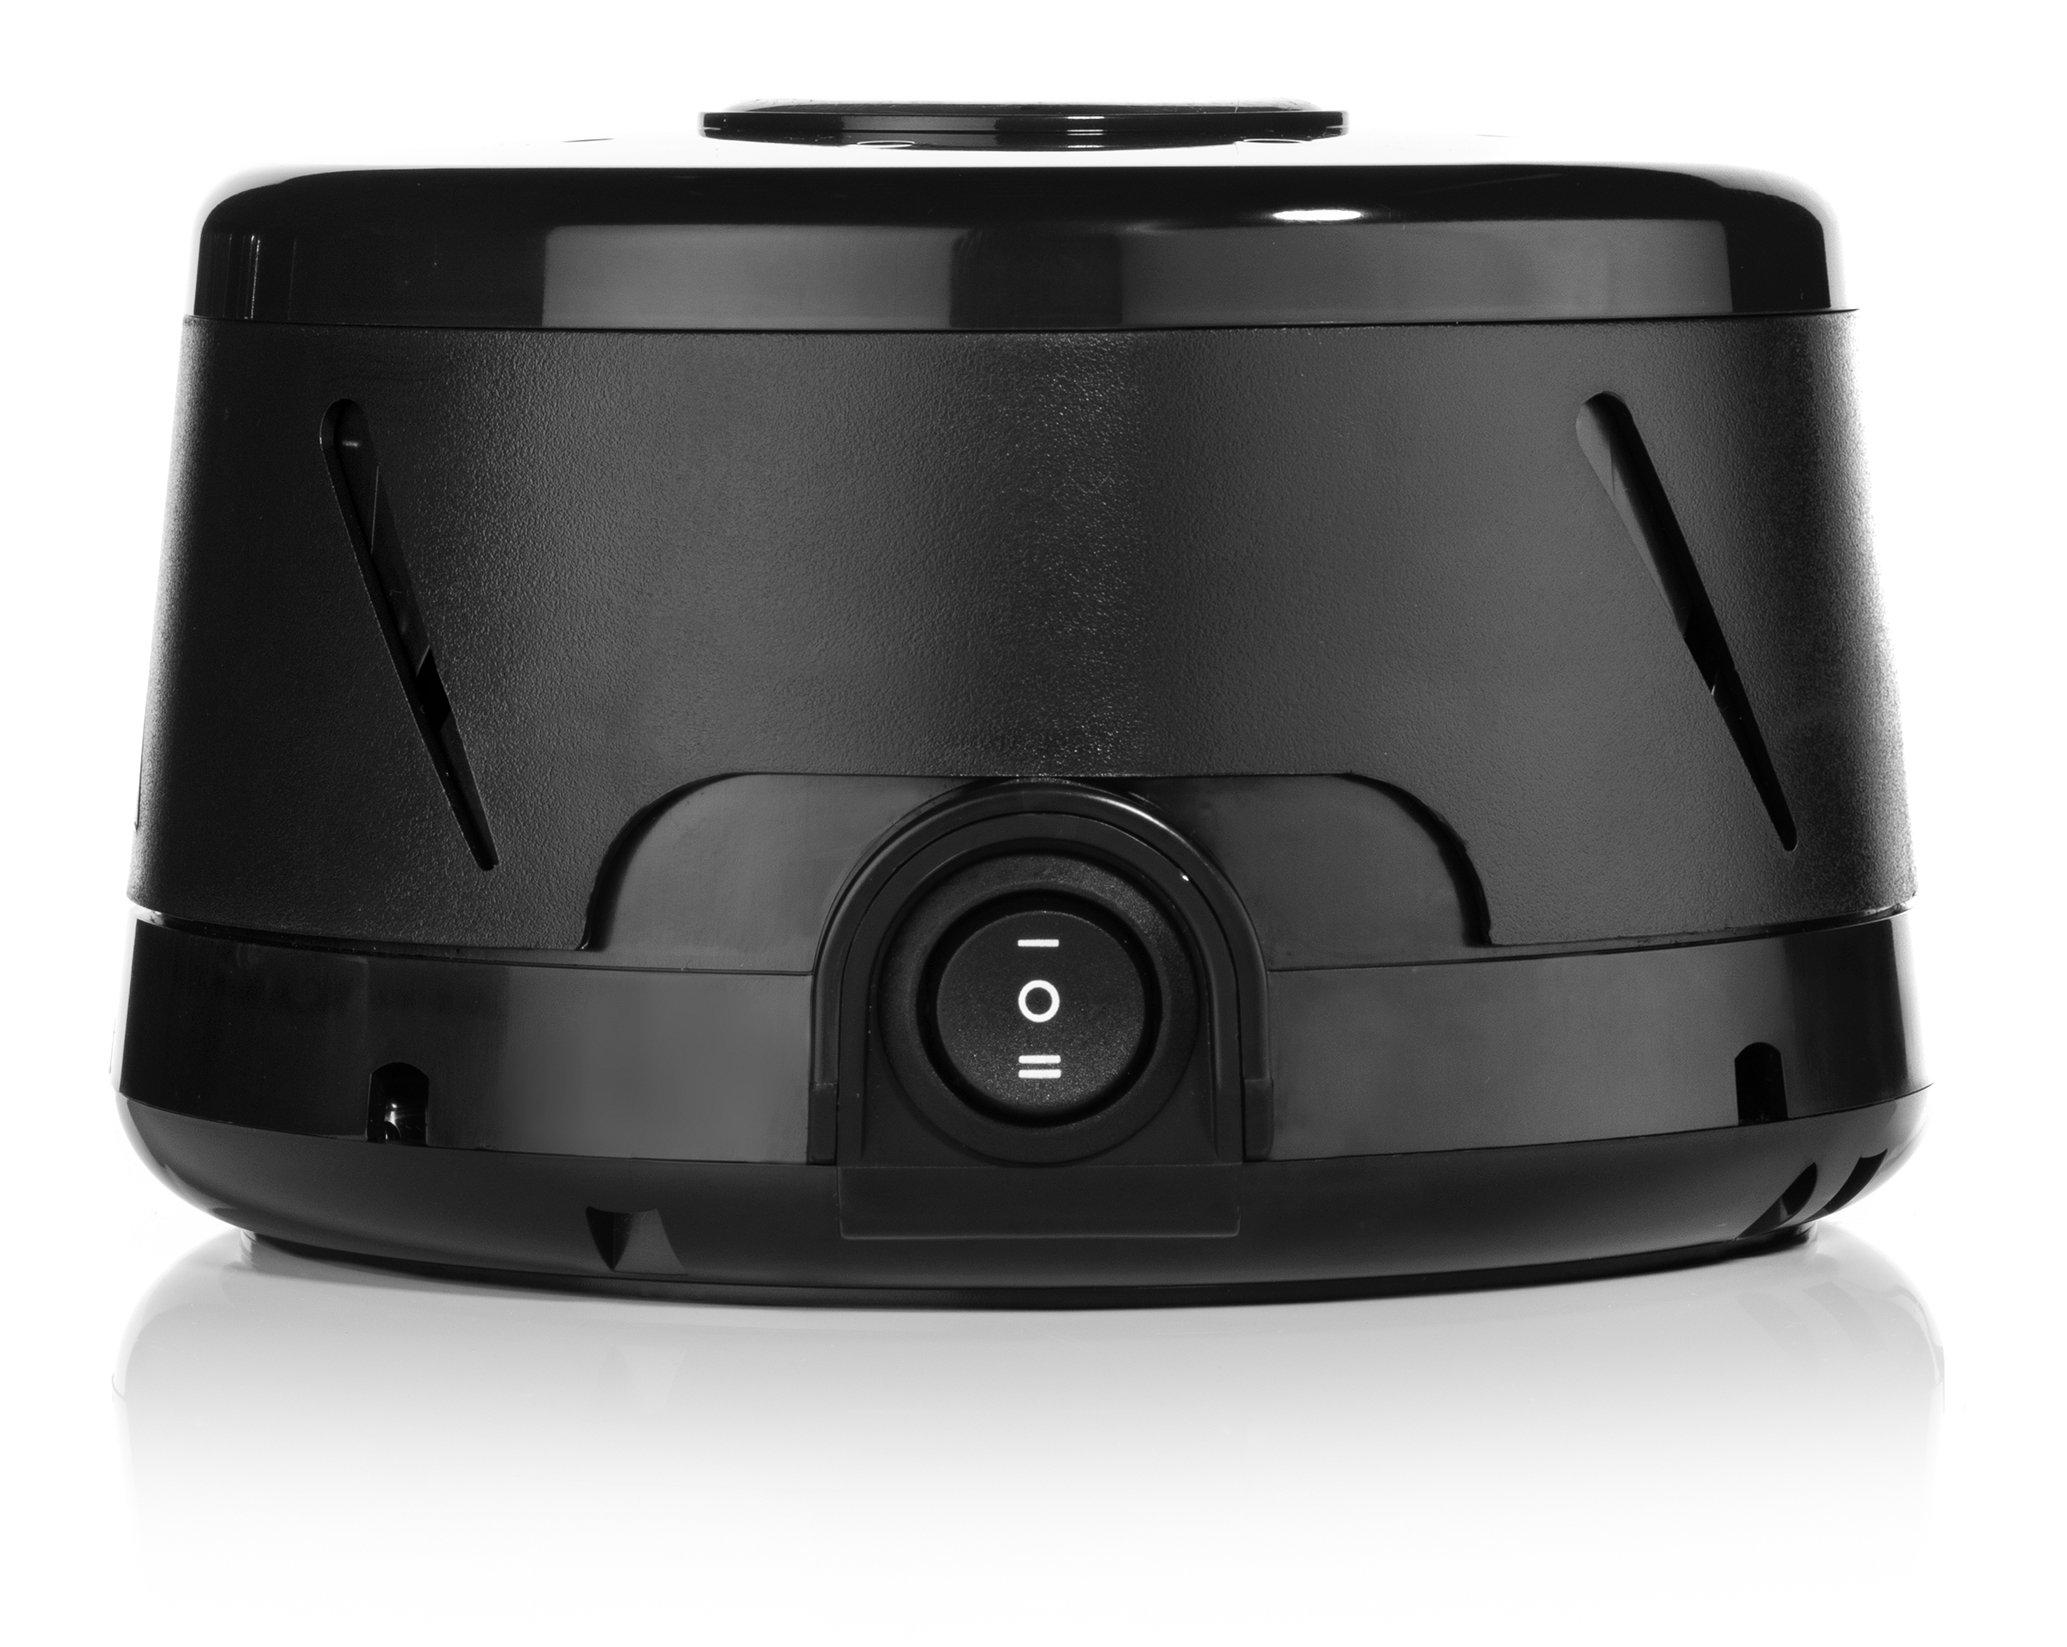 marpac dohm classic white noise sound machine black amazon. Black Bedroom Furniture Sets. Home Design Ideas